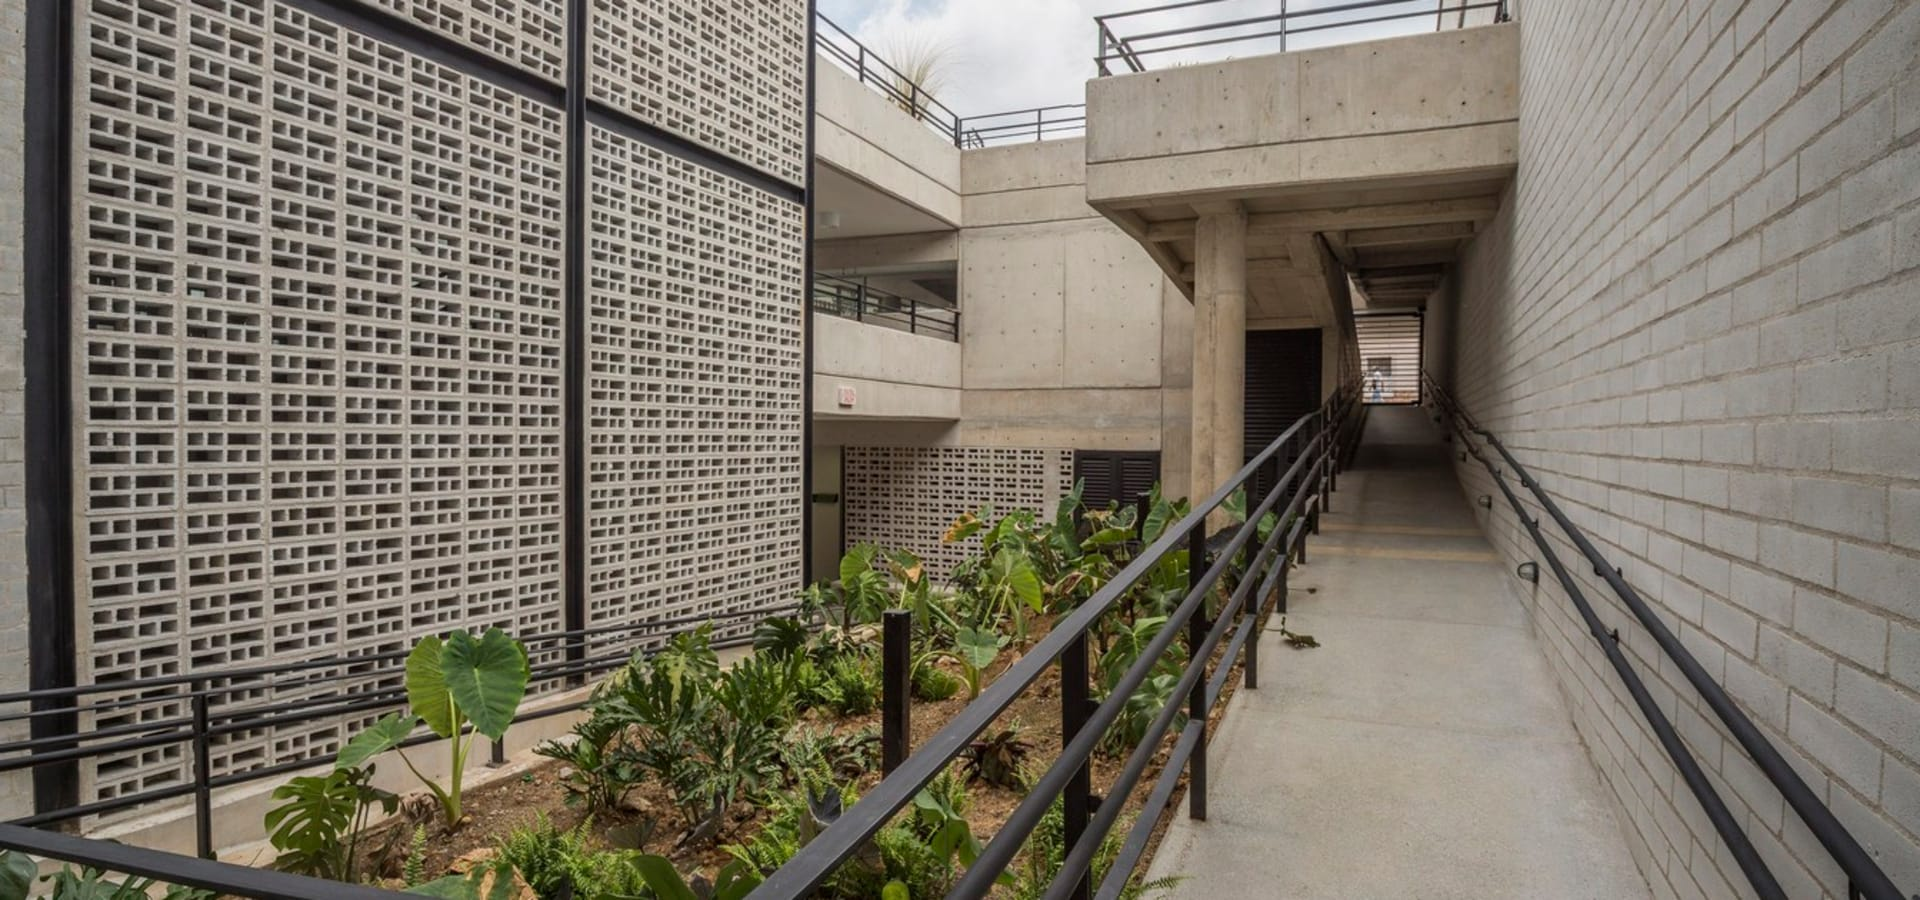 Veronica Henriques—Arquitectura Sostenible